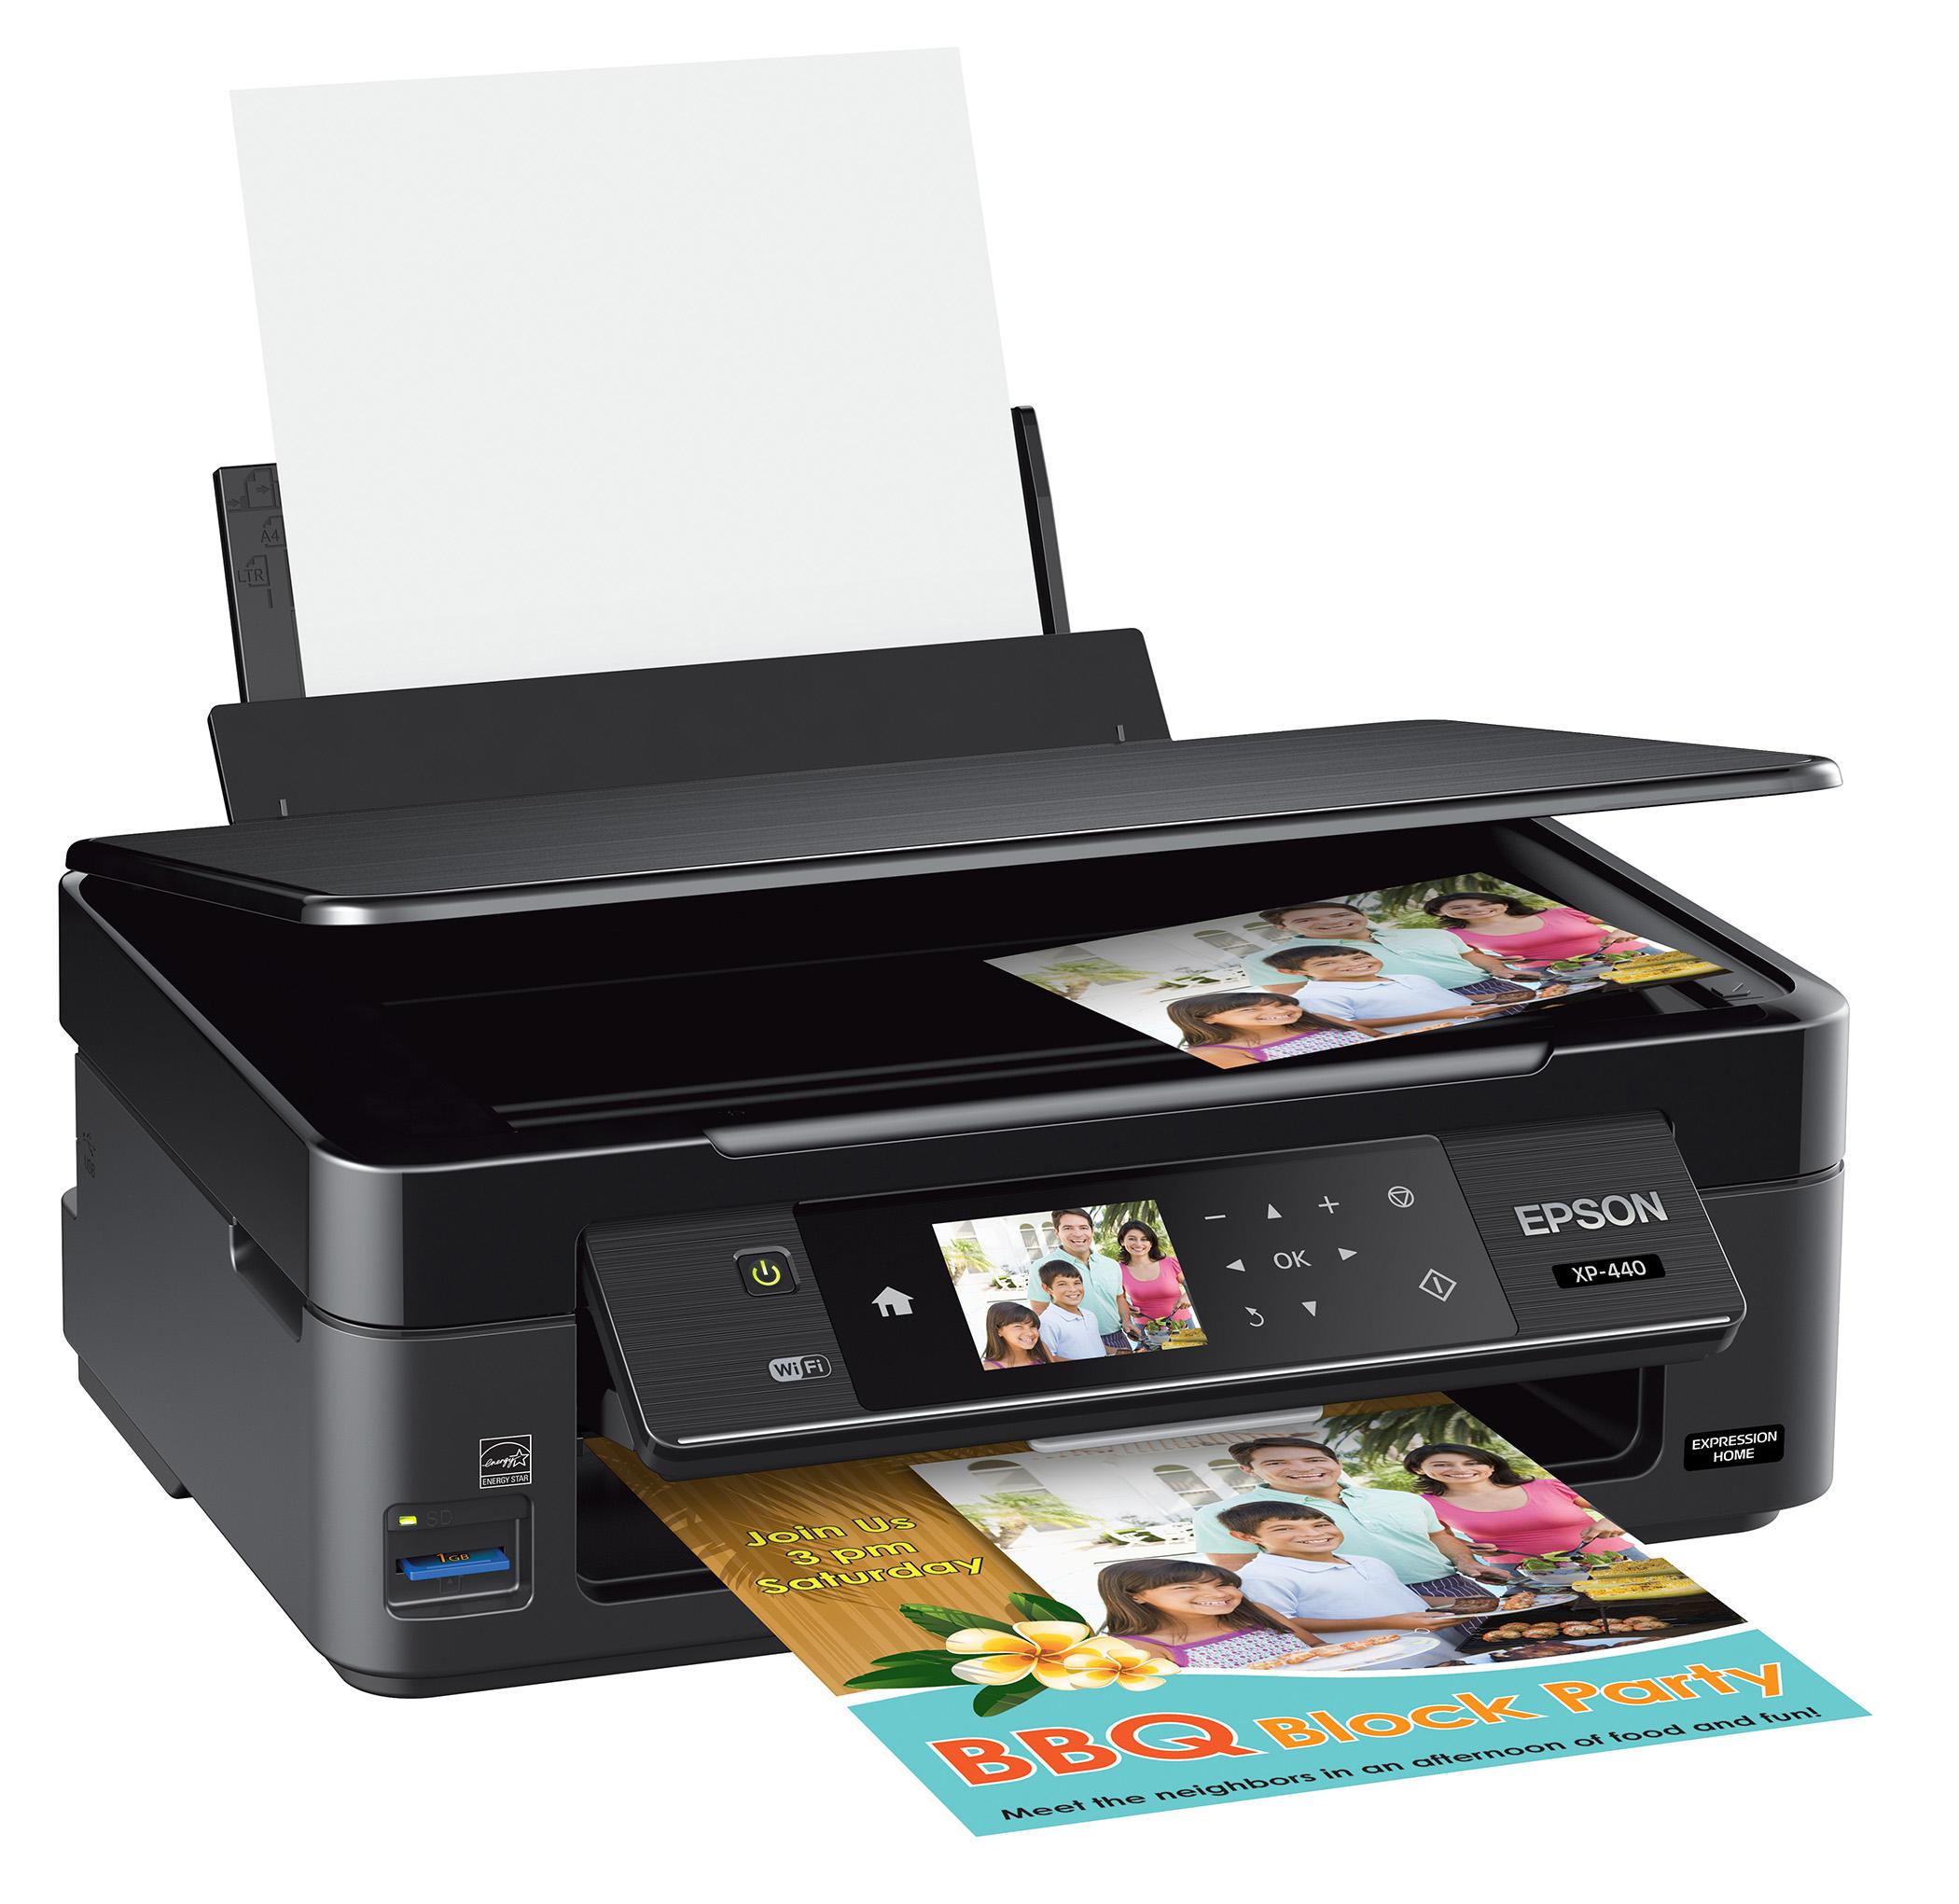 Epson Expression Home XP-440 Inkjet Multifunction Printer - Color - Plain Paper Print - Desktop